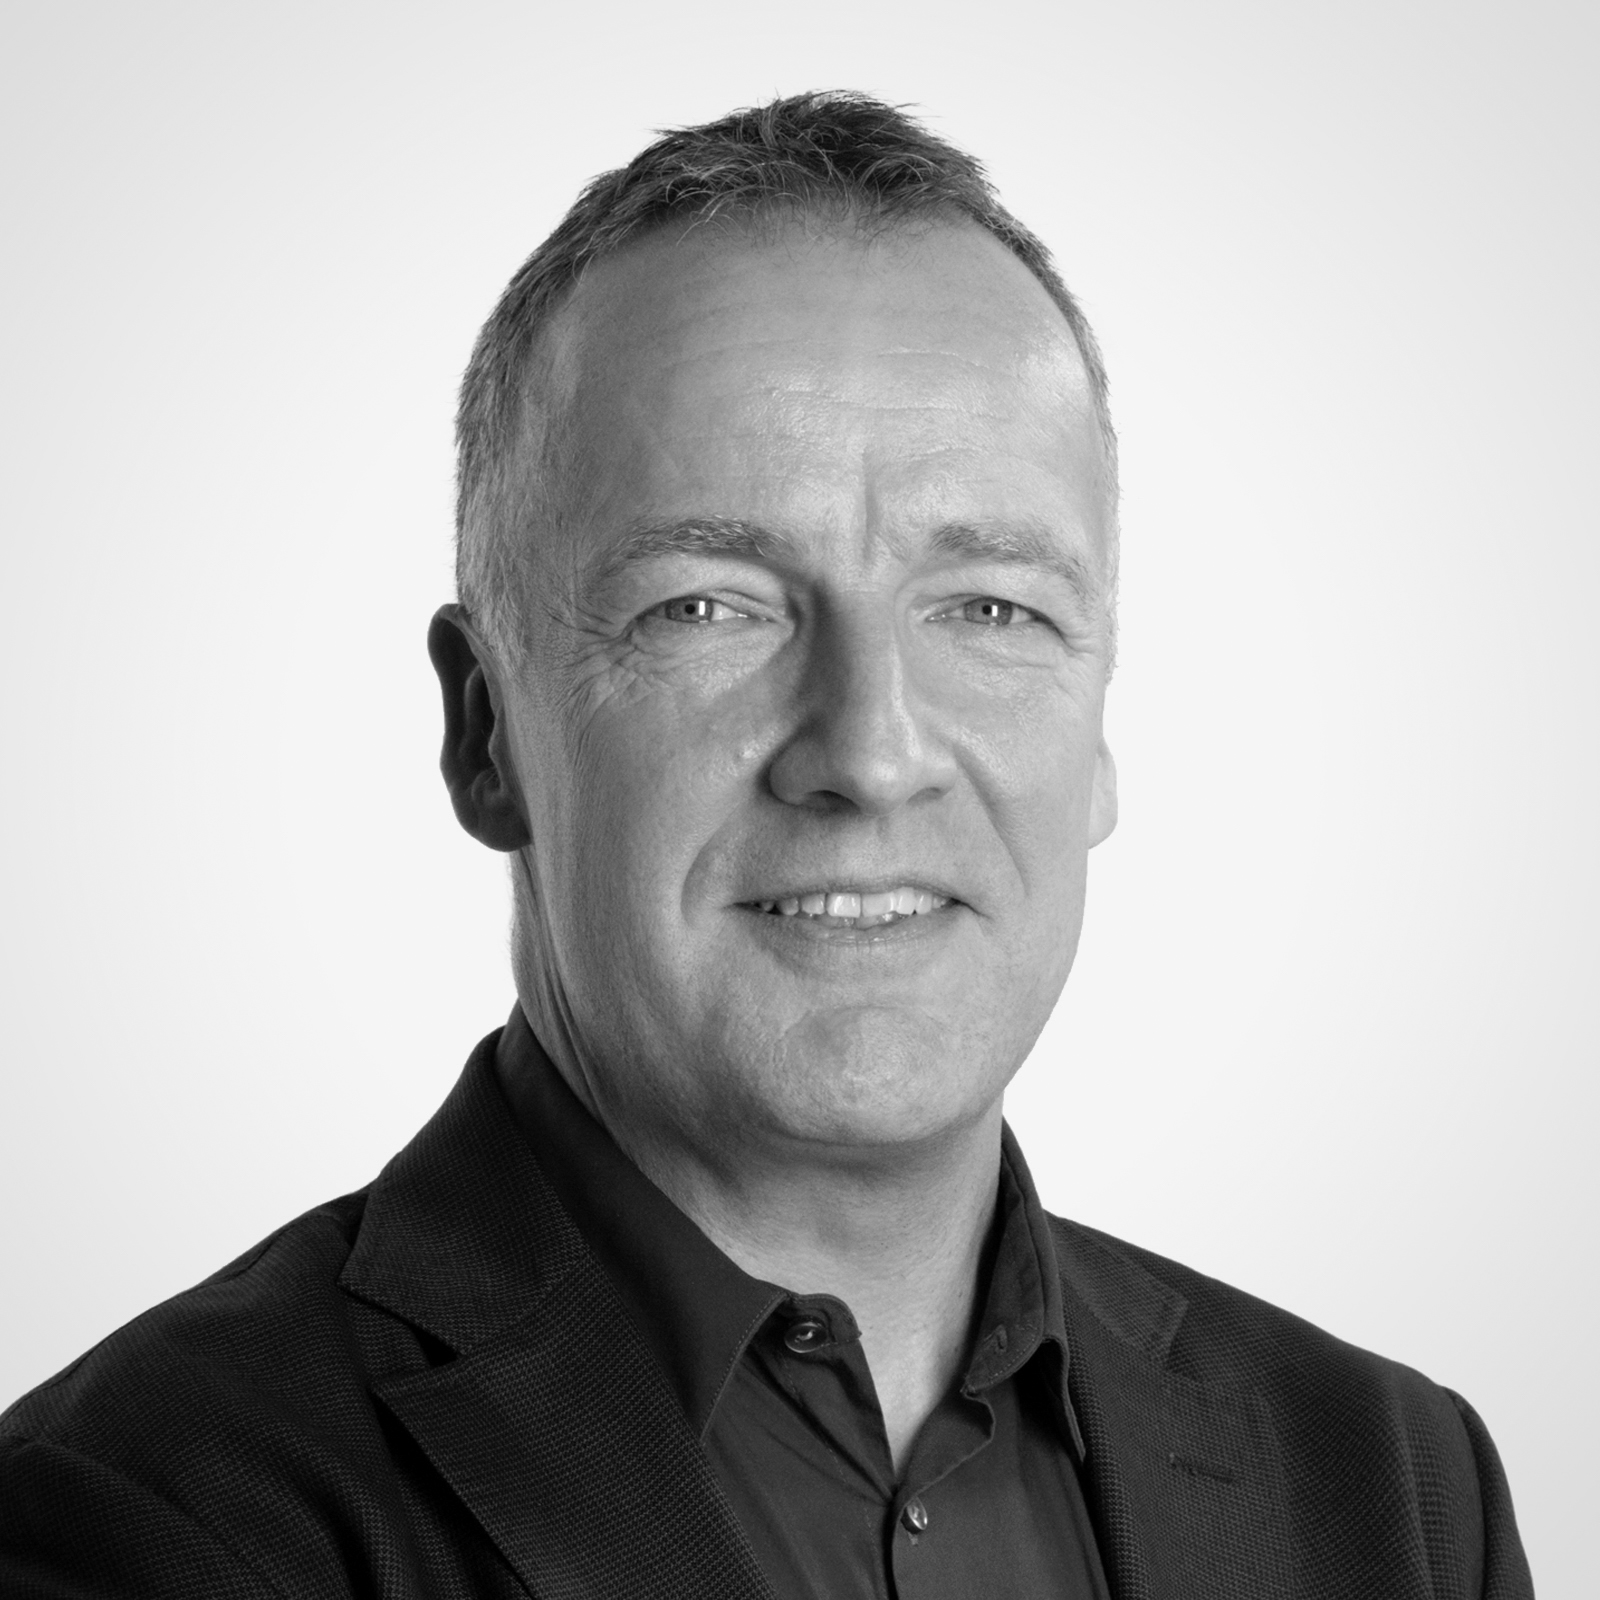 Claus Ellebjerg Due